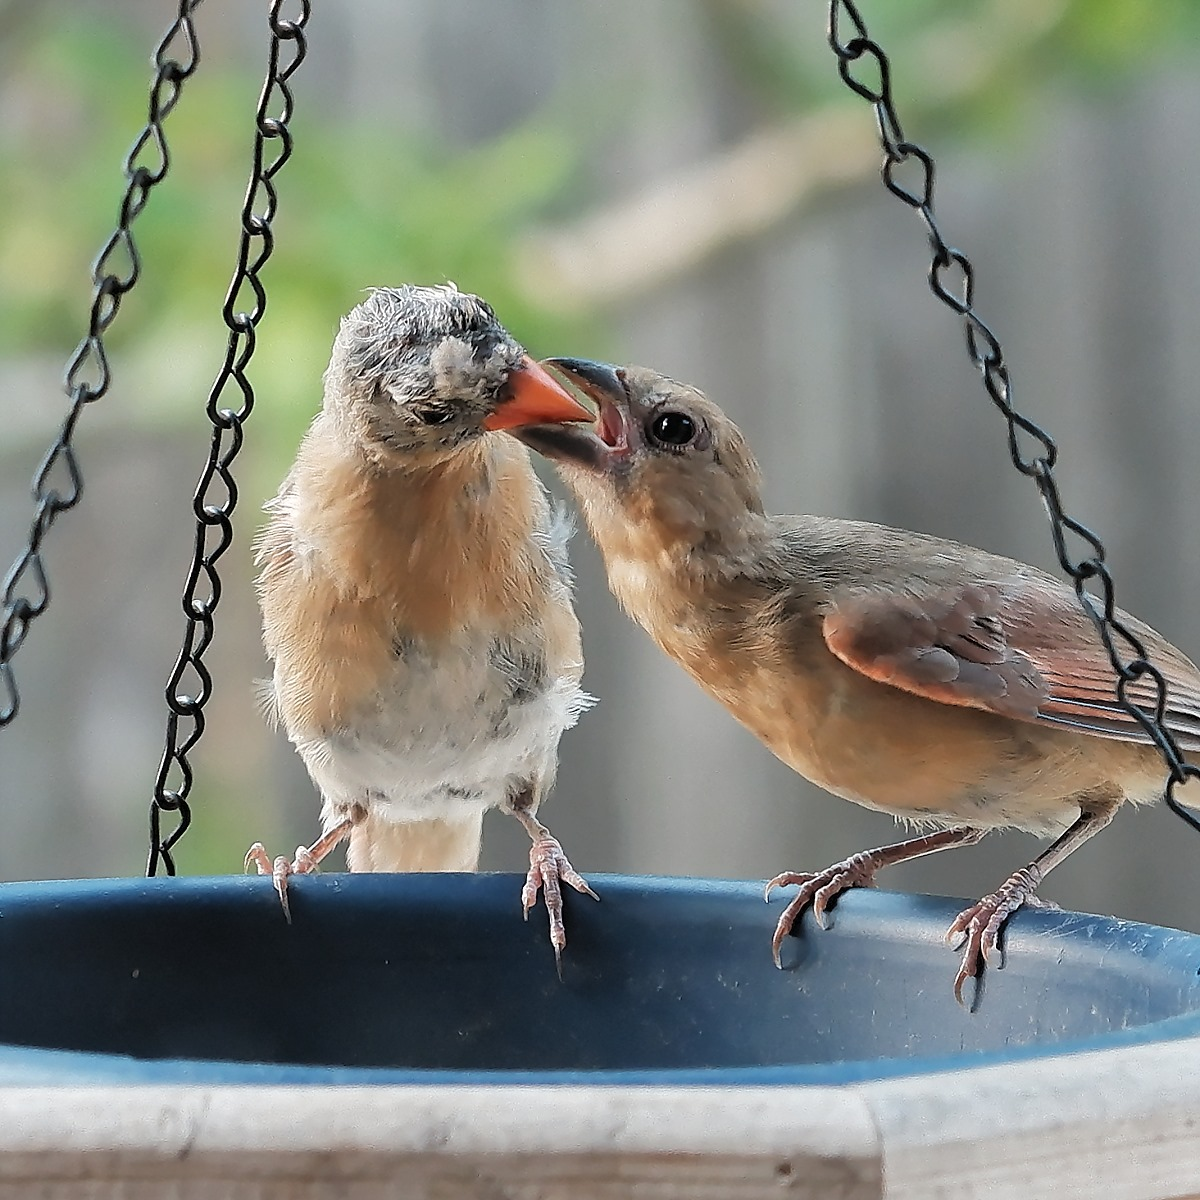 baby juvenile cardinals feeding each other